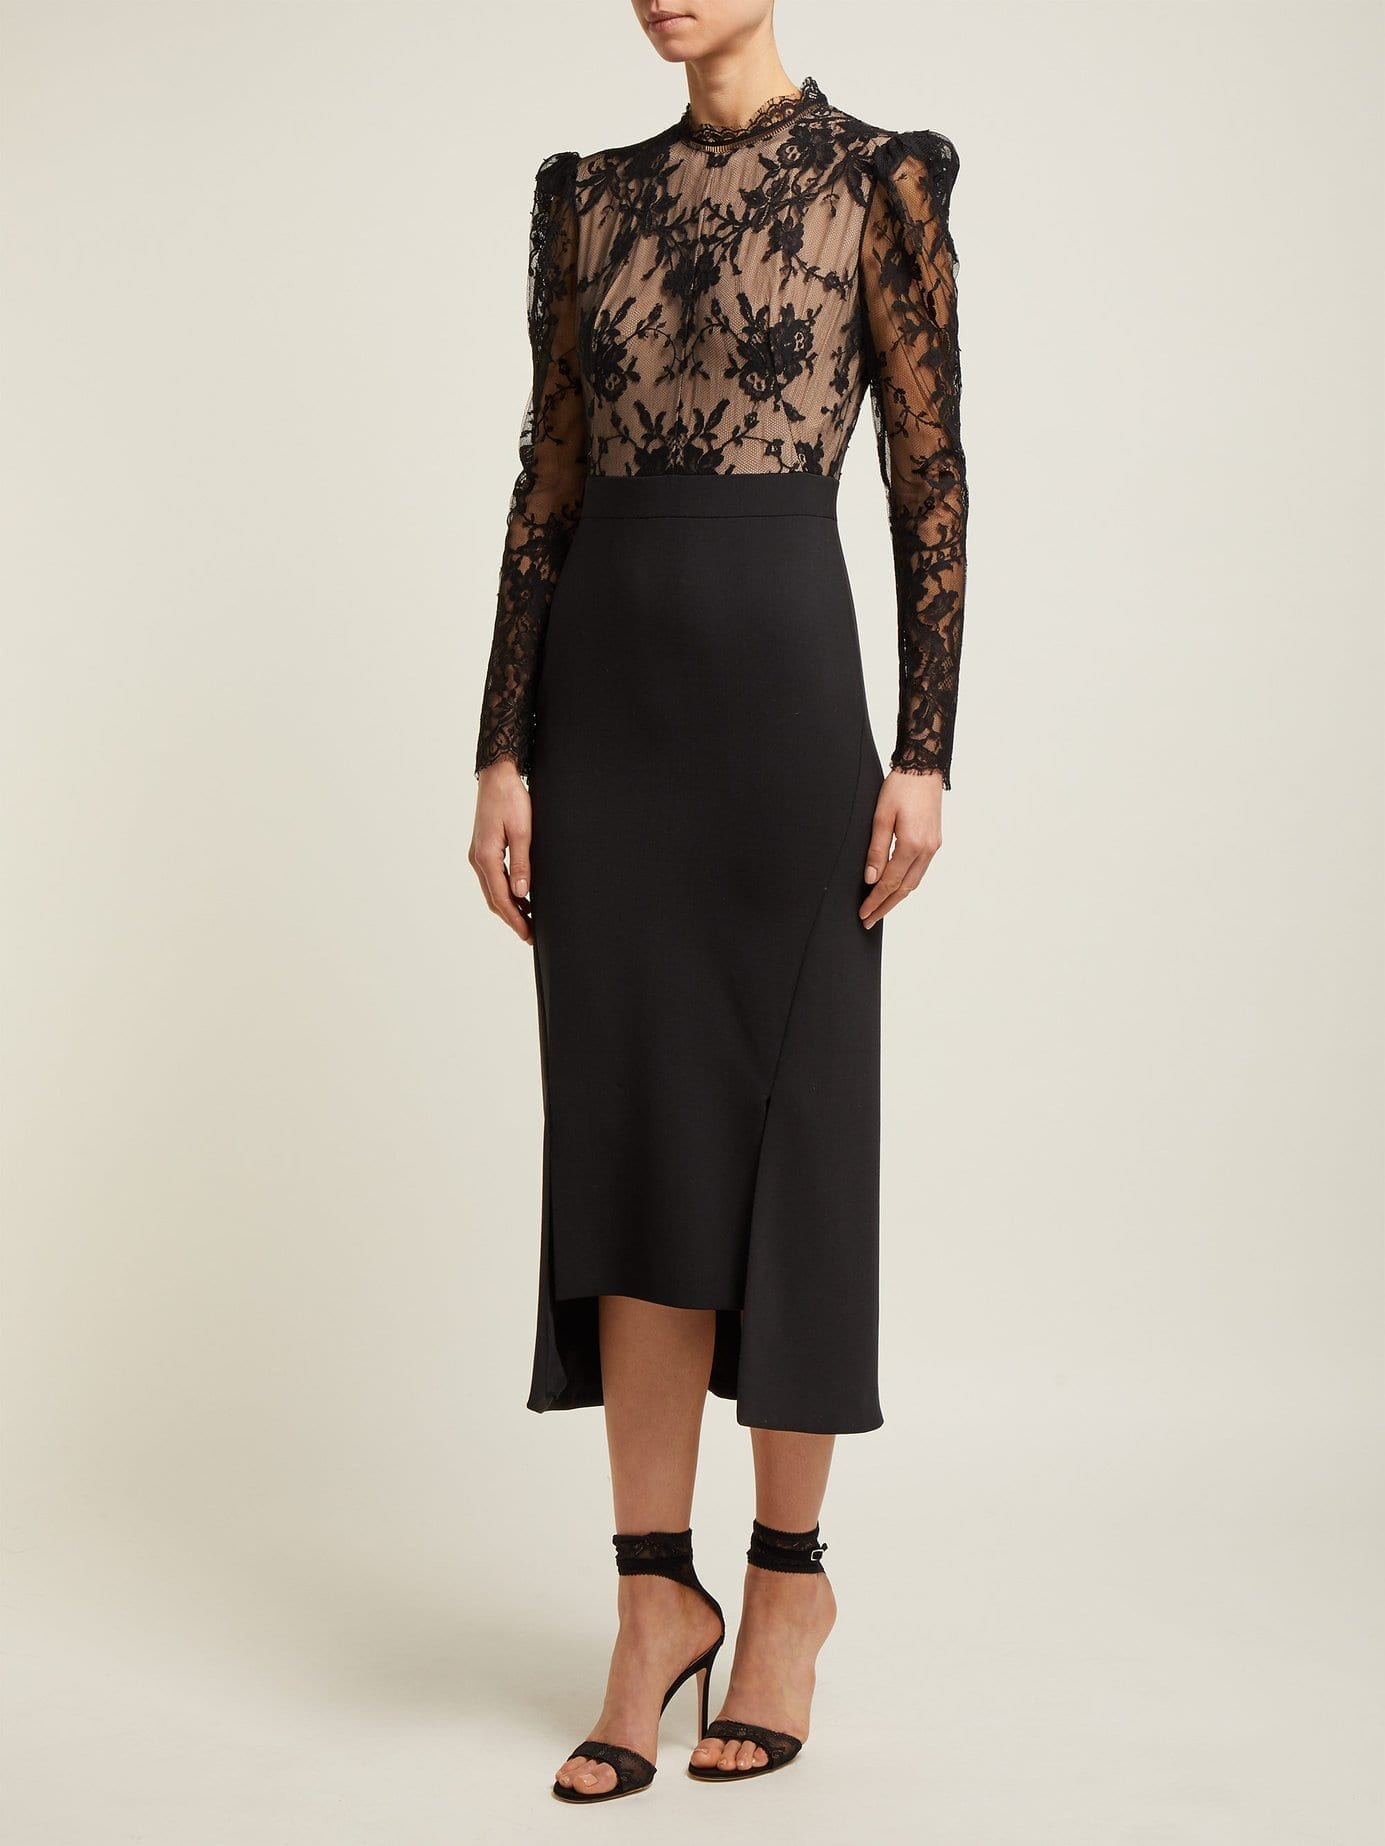 ALEXANDER MCQUEEN Sarabande-lace And Wool-blend Black Dress